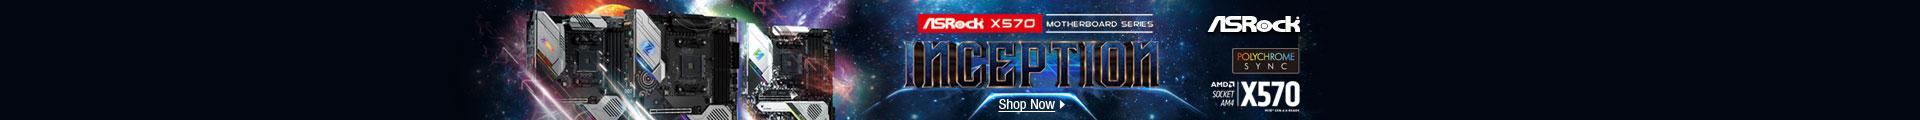 ASRock X570 MOTHERBOARD SERIES